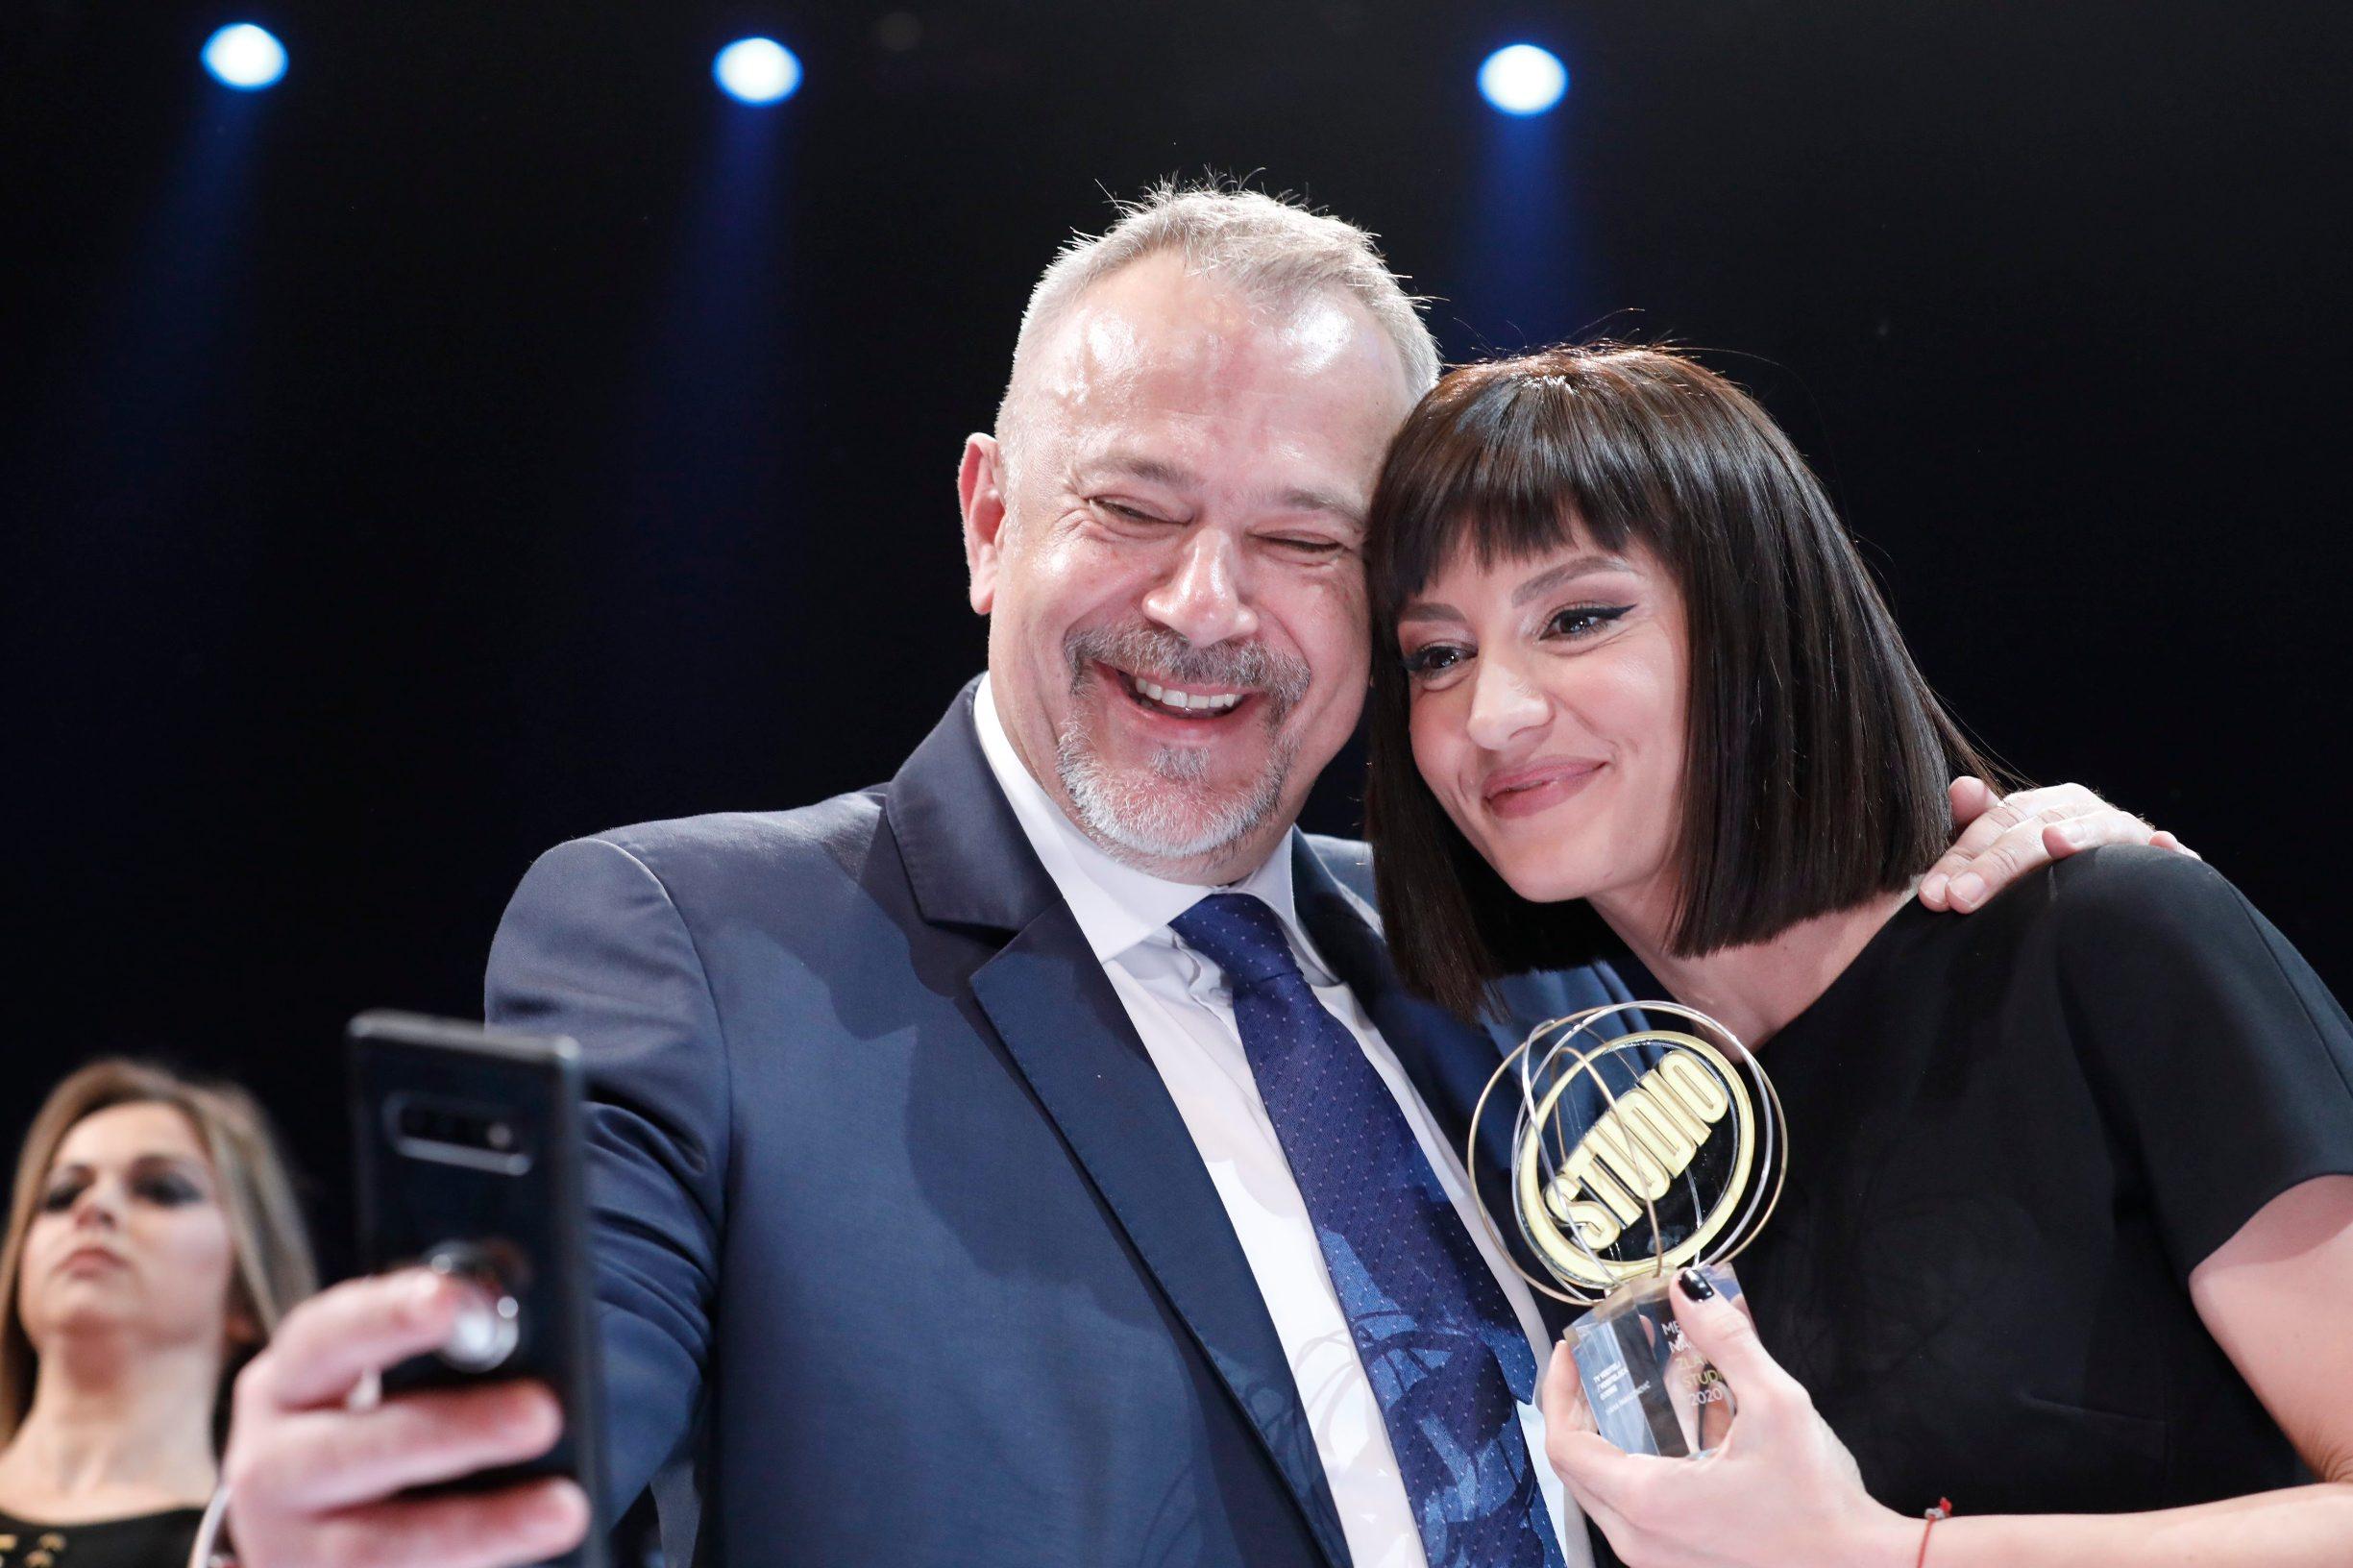 Zoran Šprajc i Ivana Paradžiković